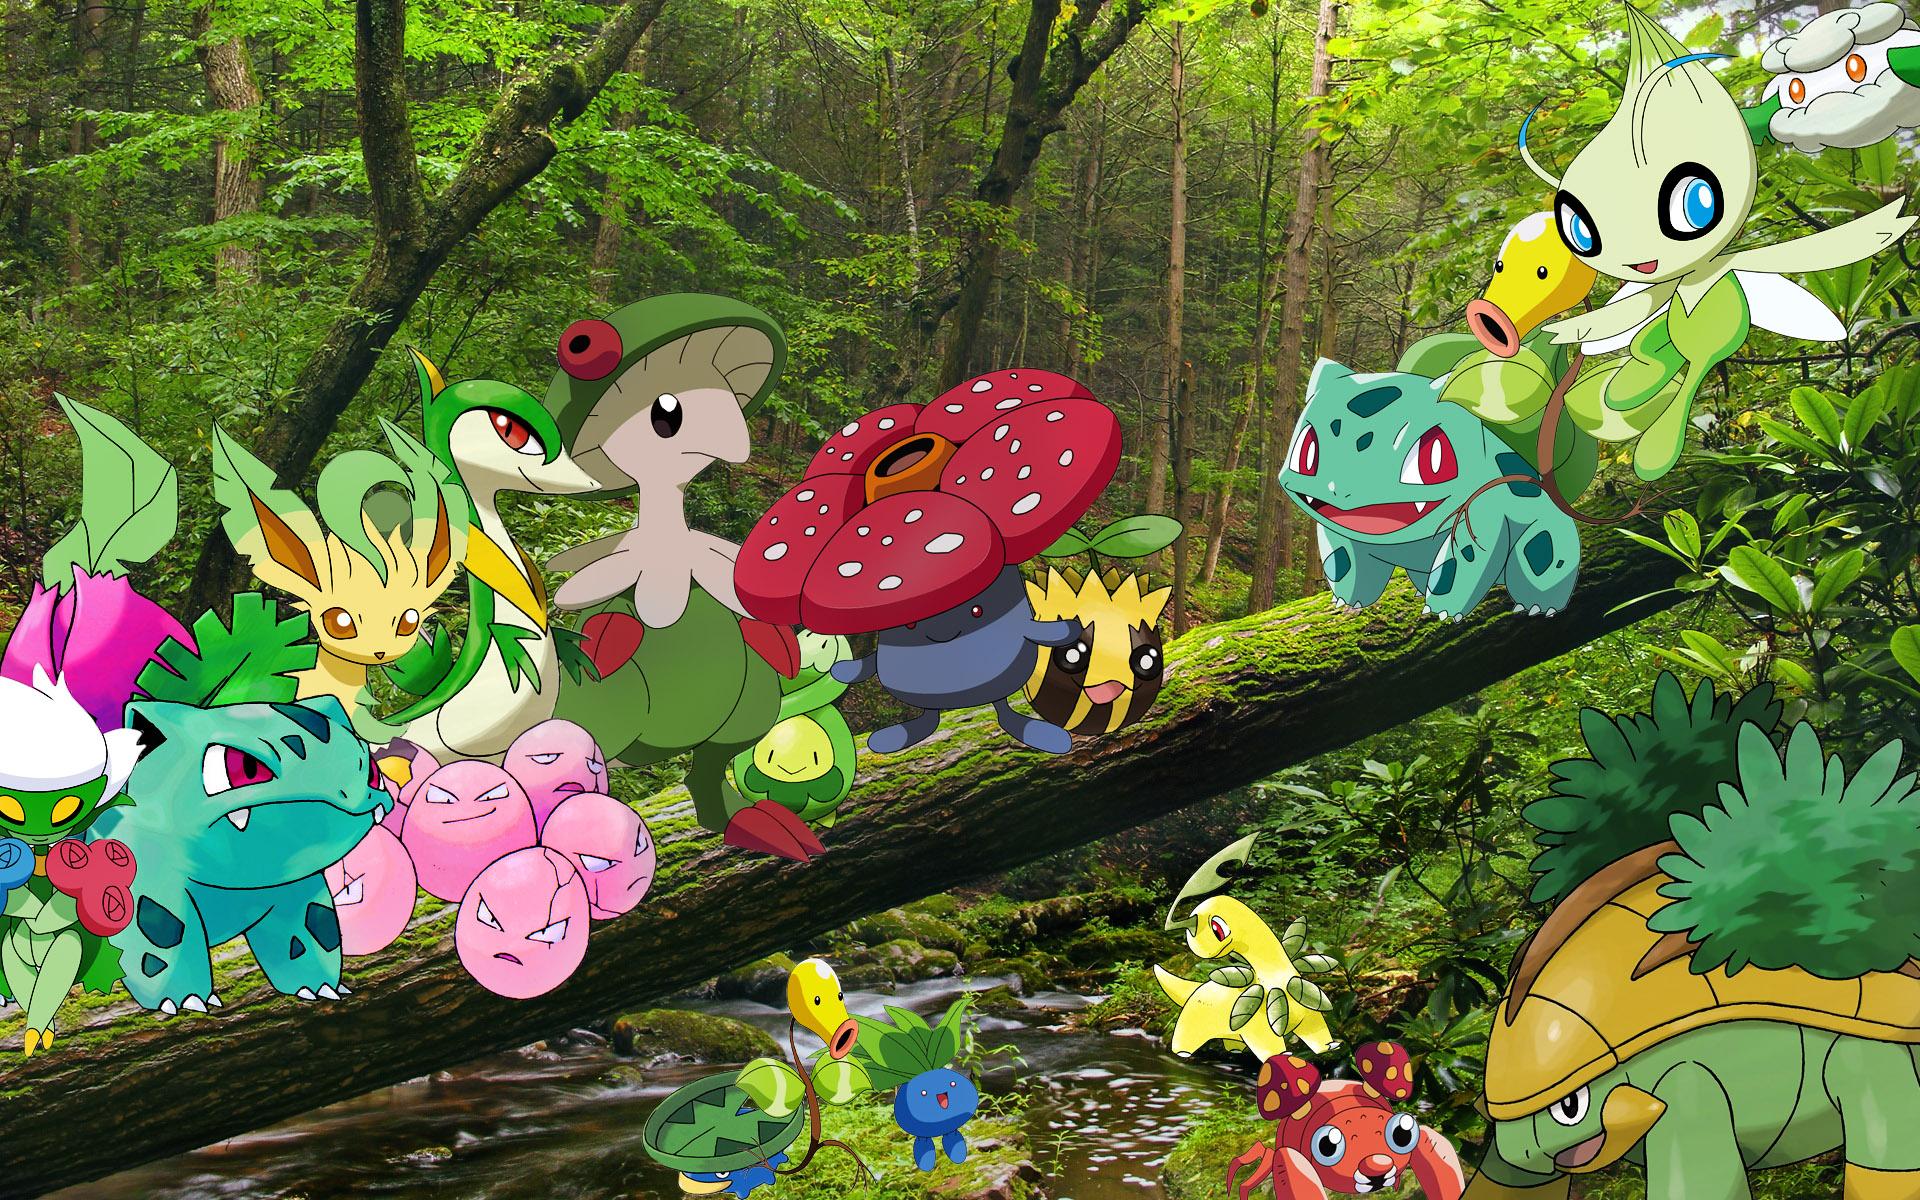 Grass Pokemon Wallpaper By Kyoshian On Deviantart